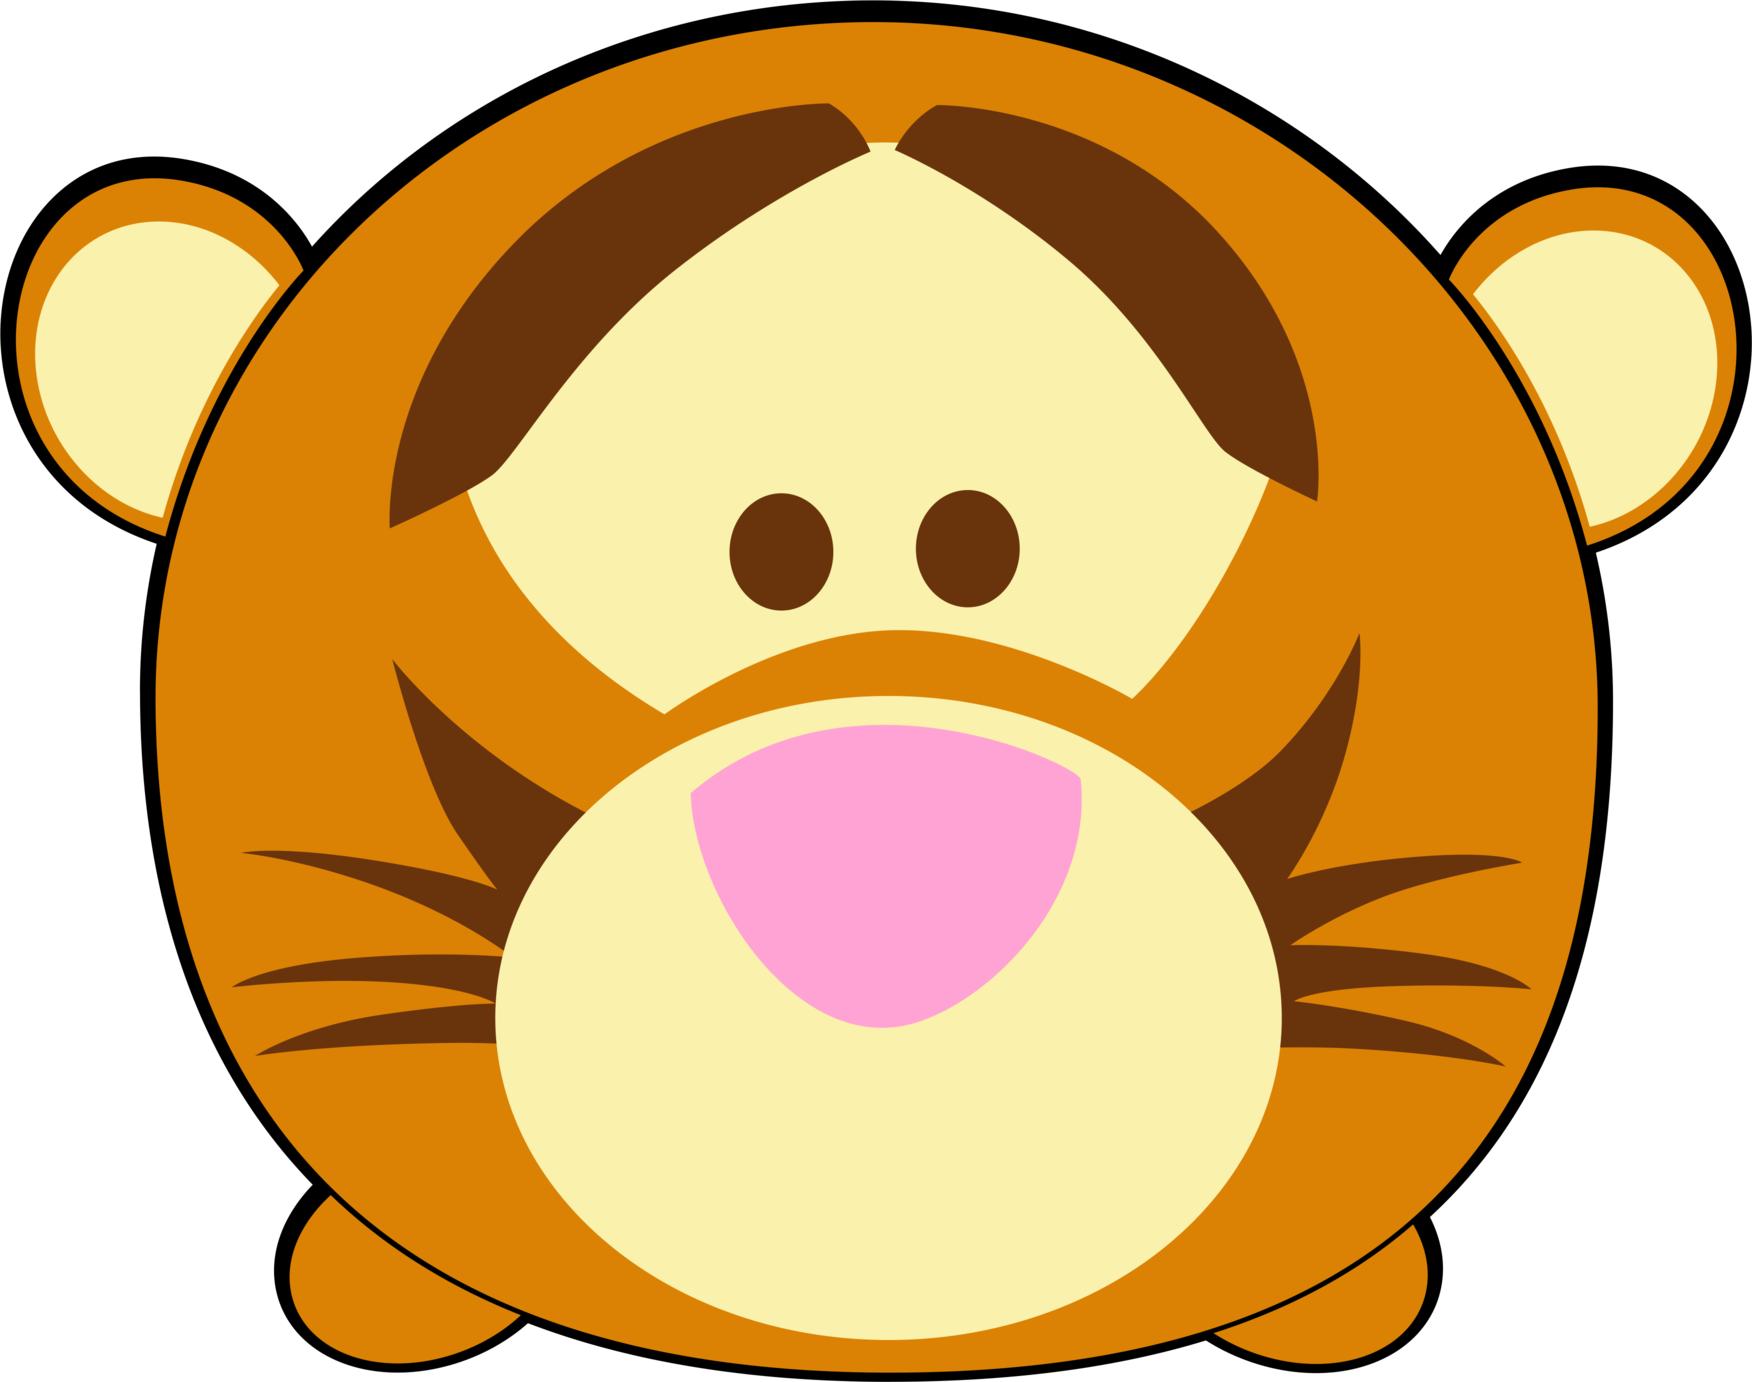 Disney Tsum Tsum Clipart 9: Disney Tsum Tsum Clipart 12